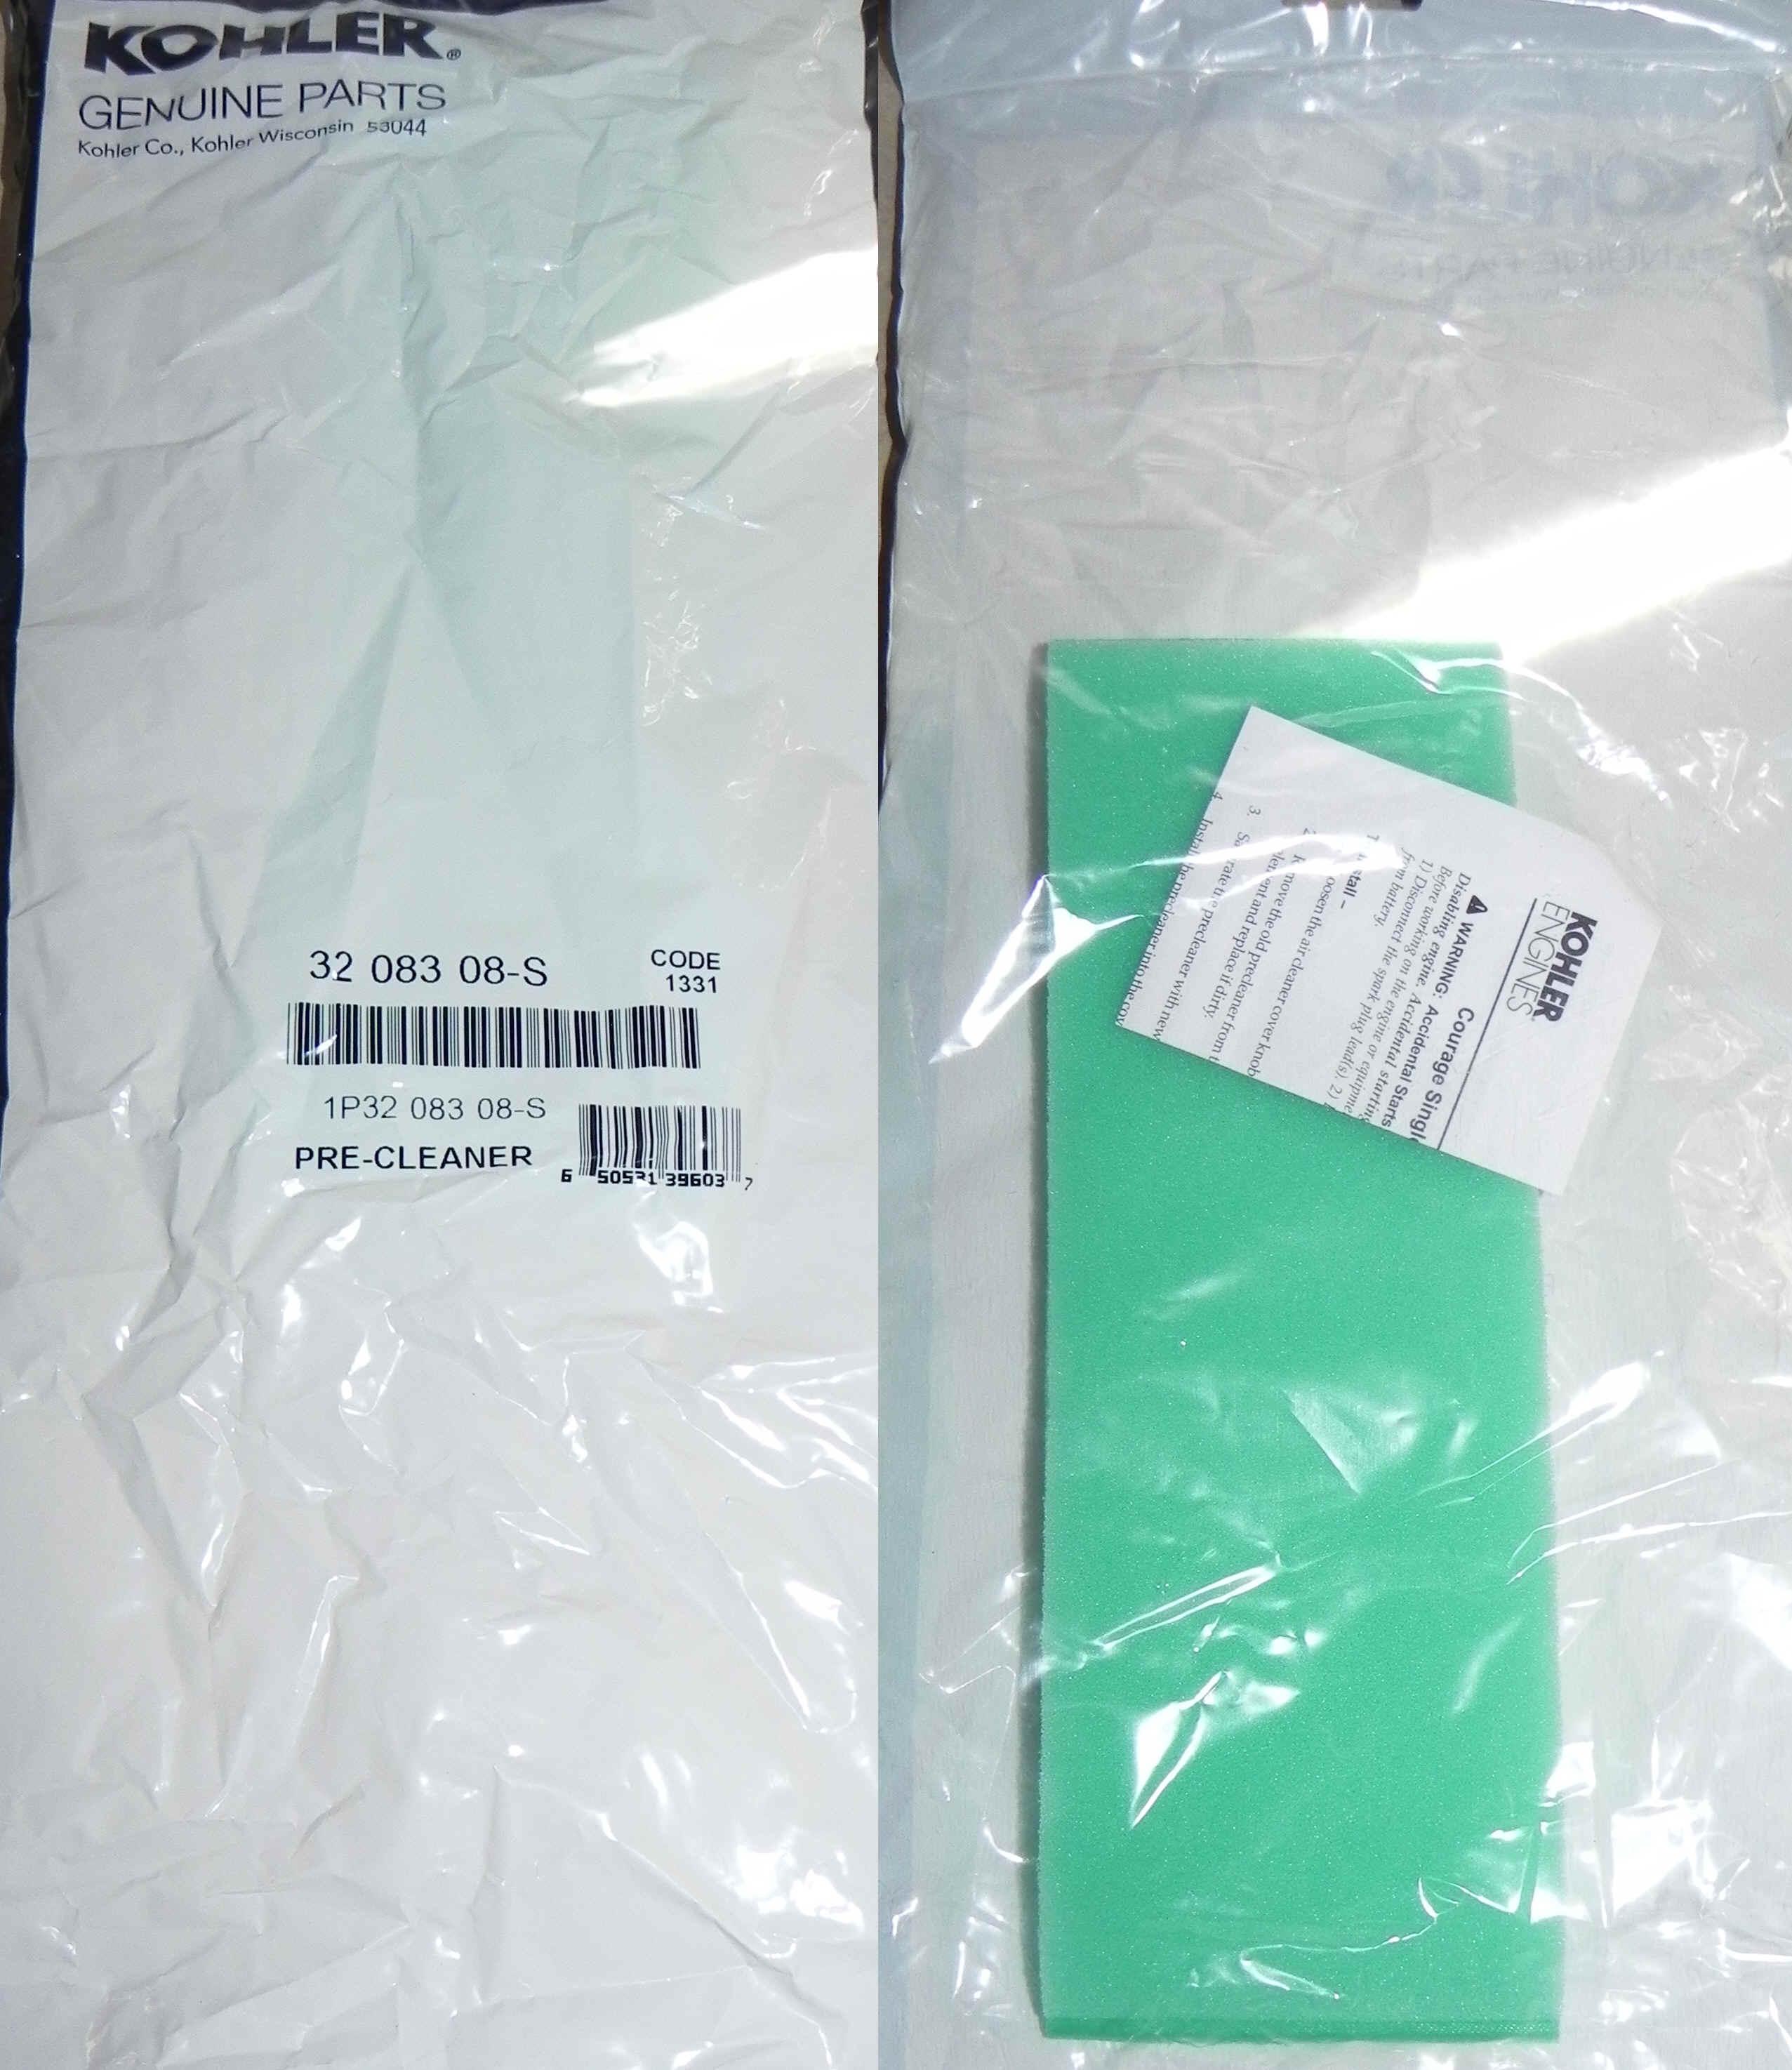 Kohler Air Filter Part No 32 083 08-S